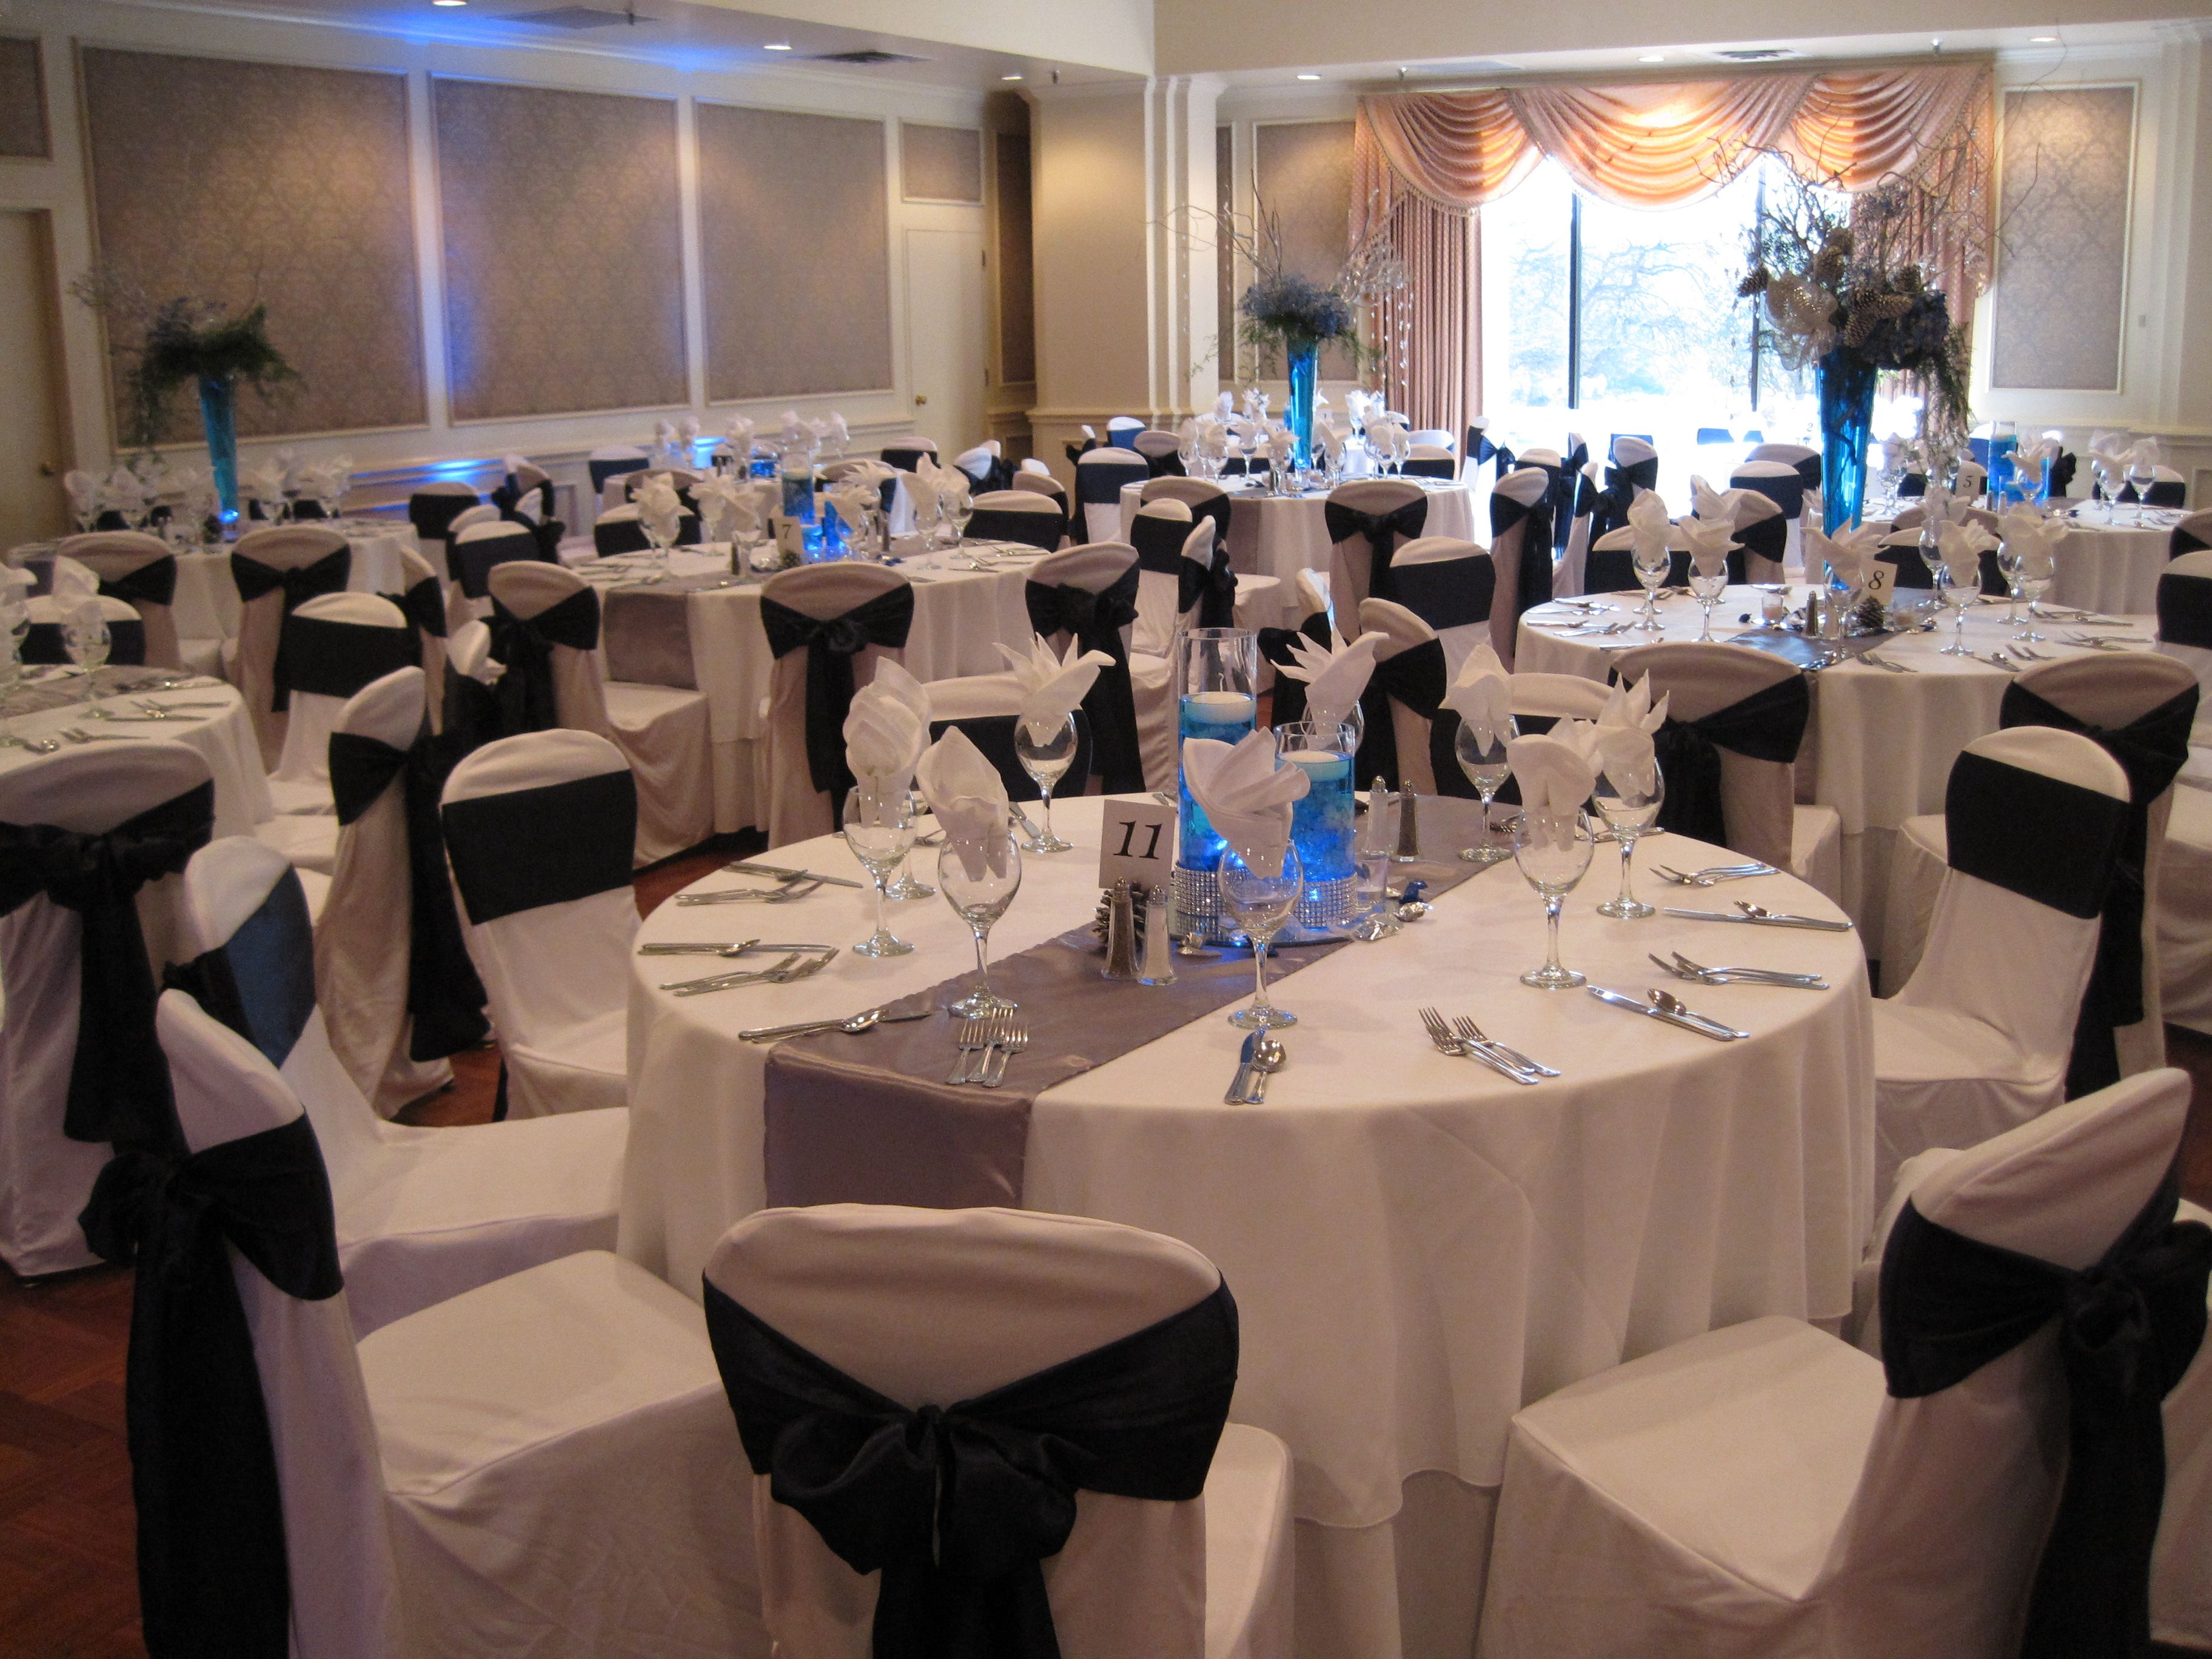 White Navy Blue And Silver Wedding Setup Winter Wonderland Theme